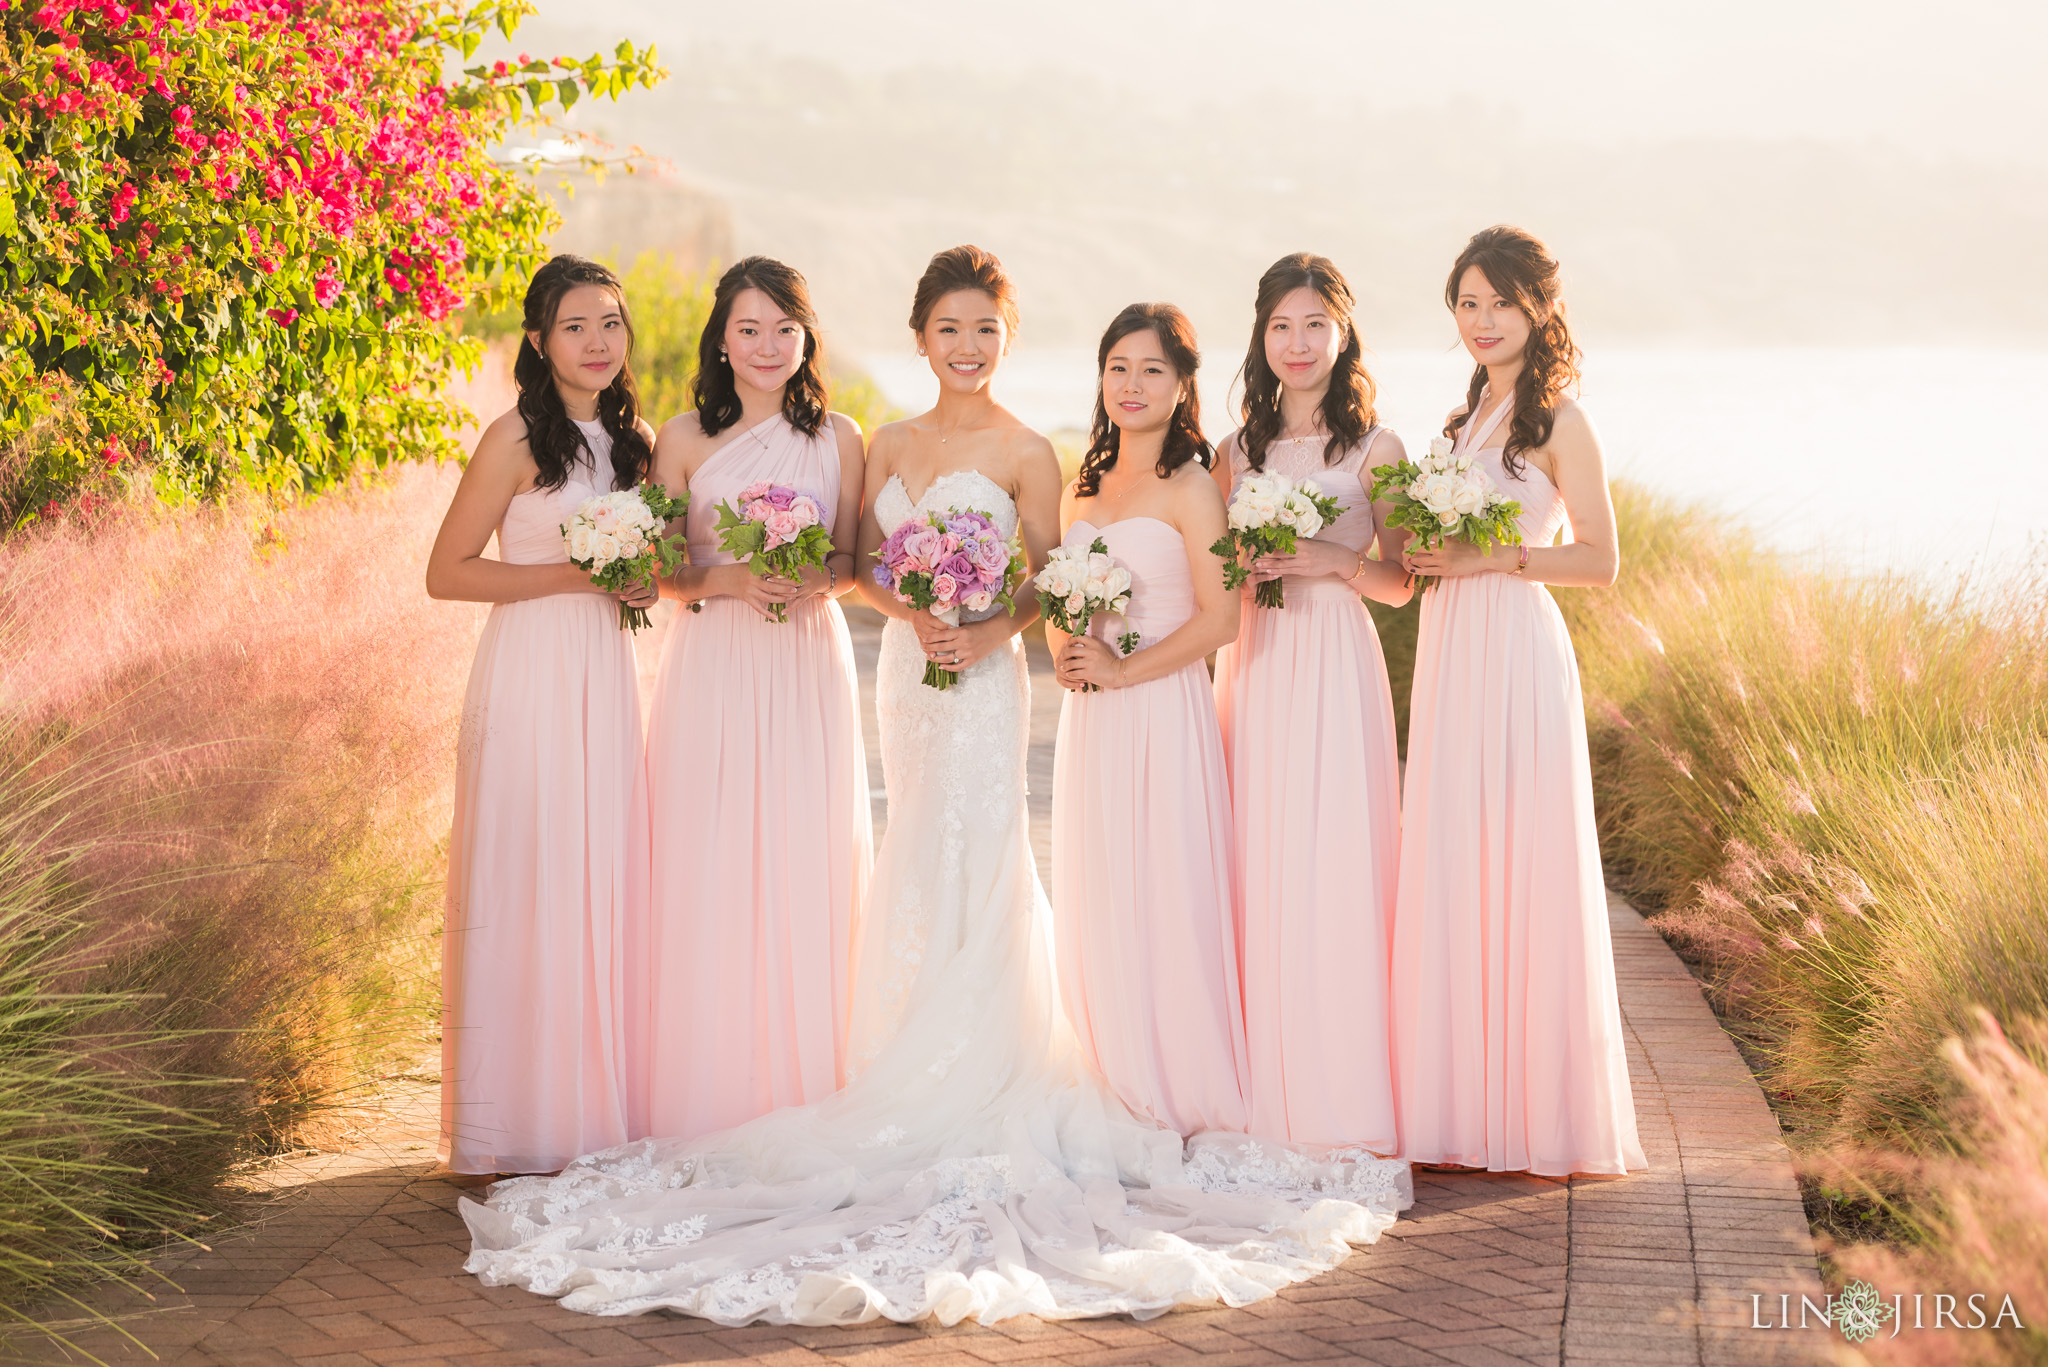 06 terranea resort bridal party wedding photography